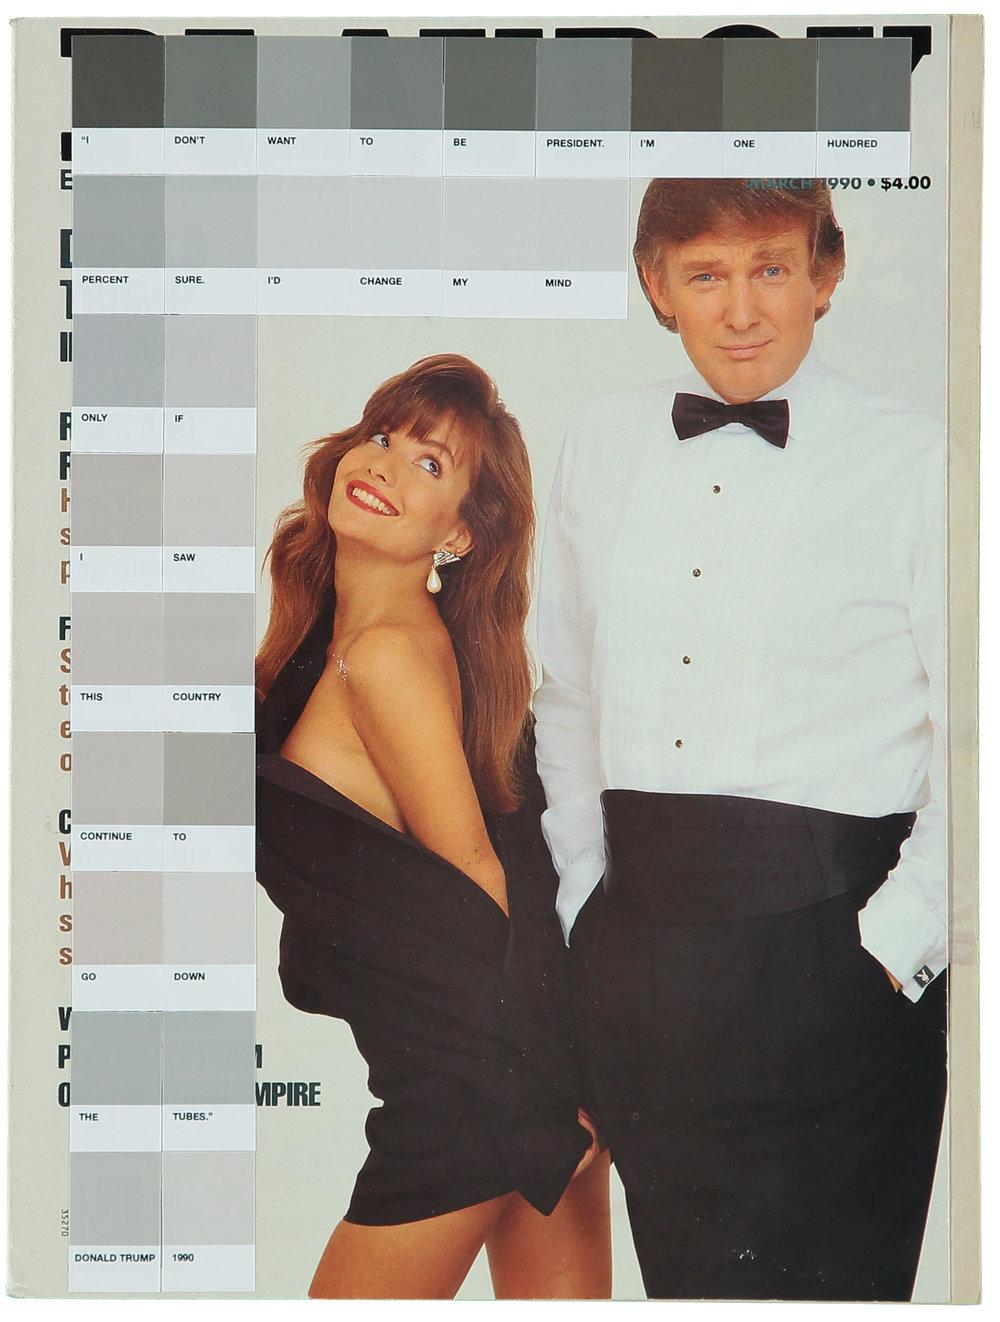 Donald Trump, Playboy, 1990